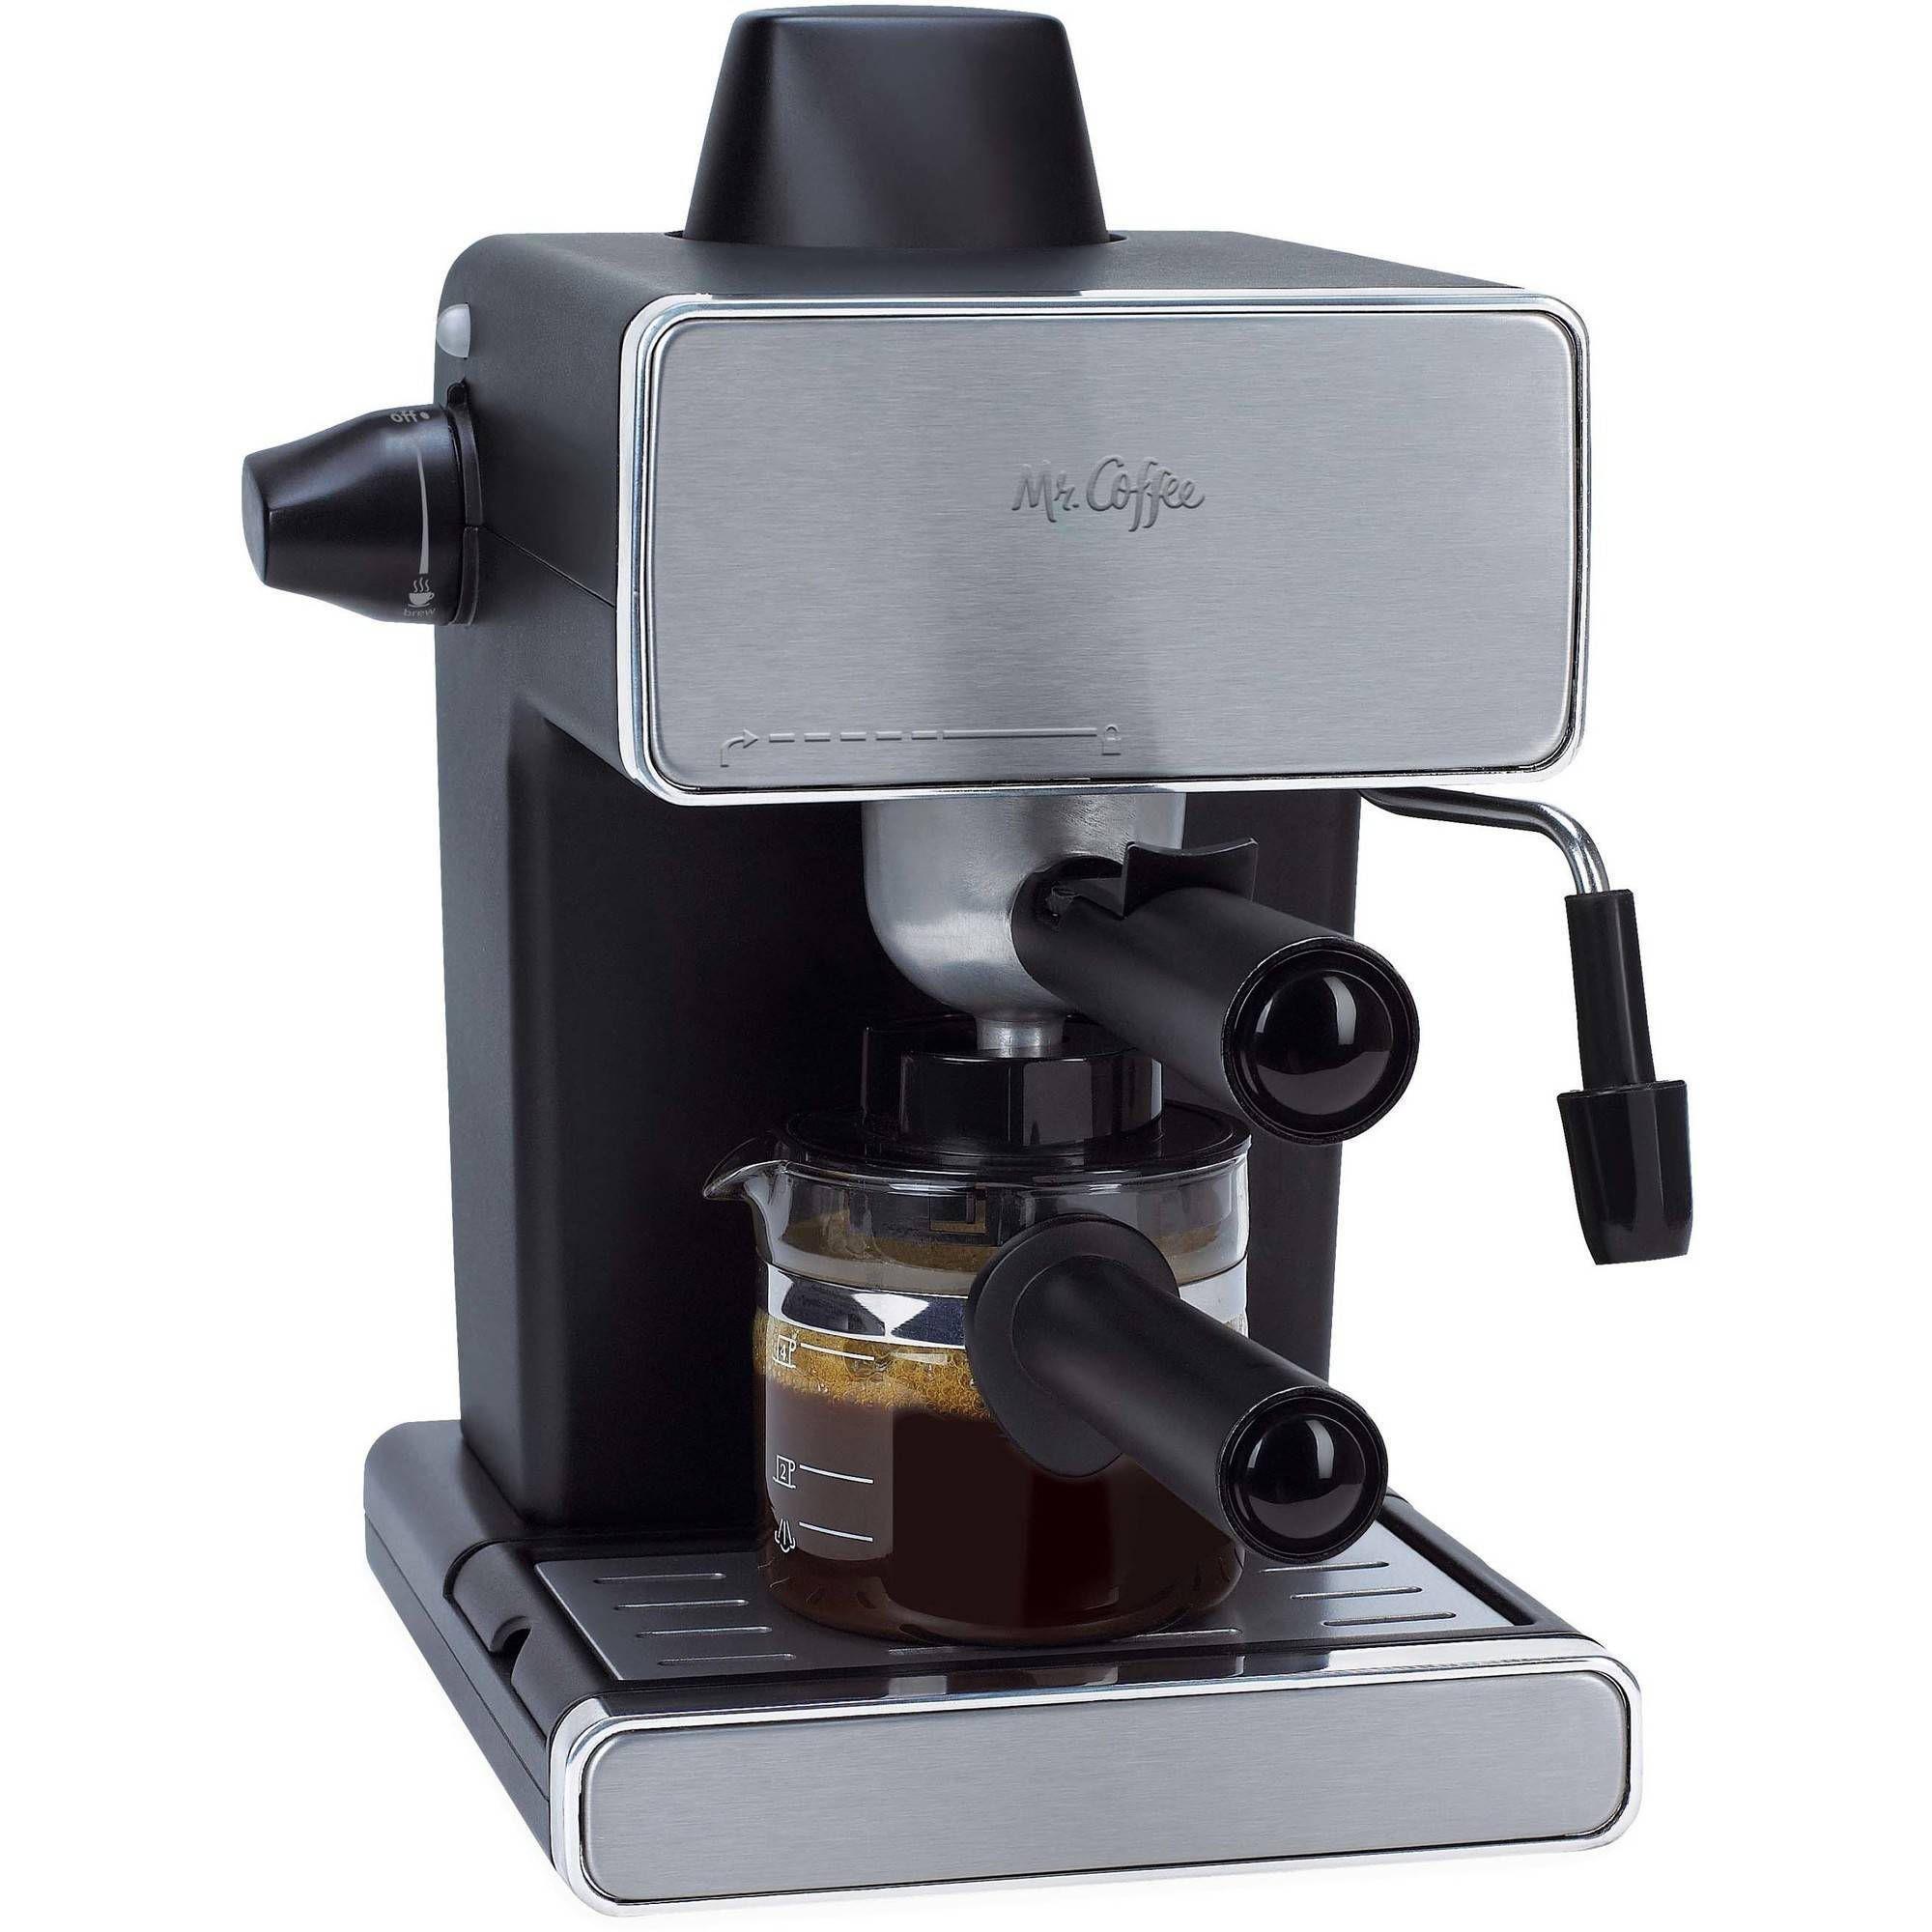 Ninja Coffee Bar Auto Iq Brewer With Glass Carafe Cf080